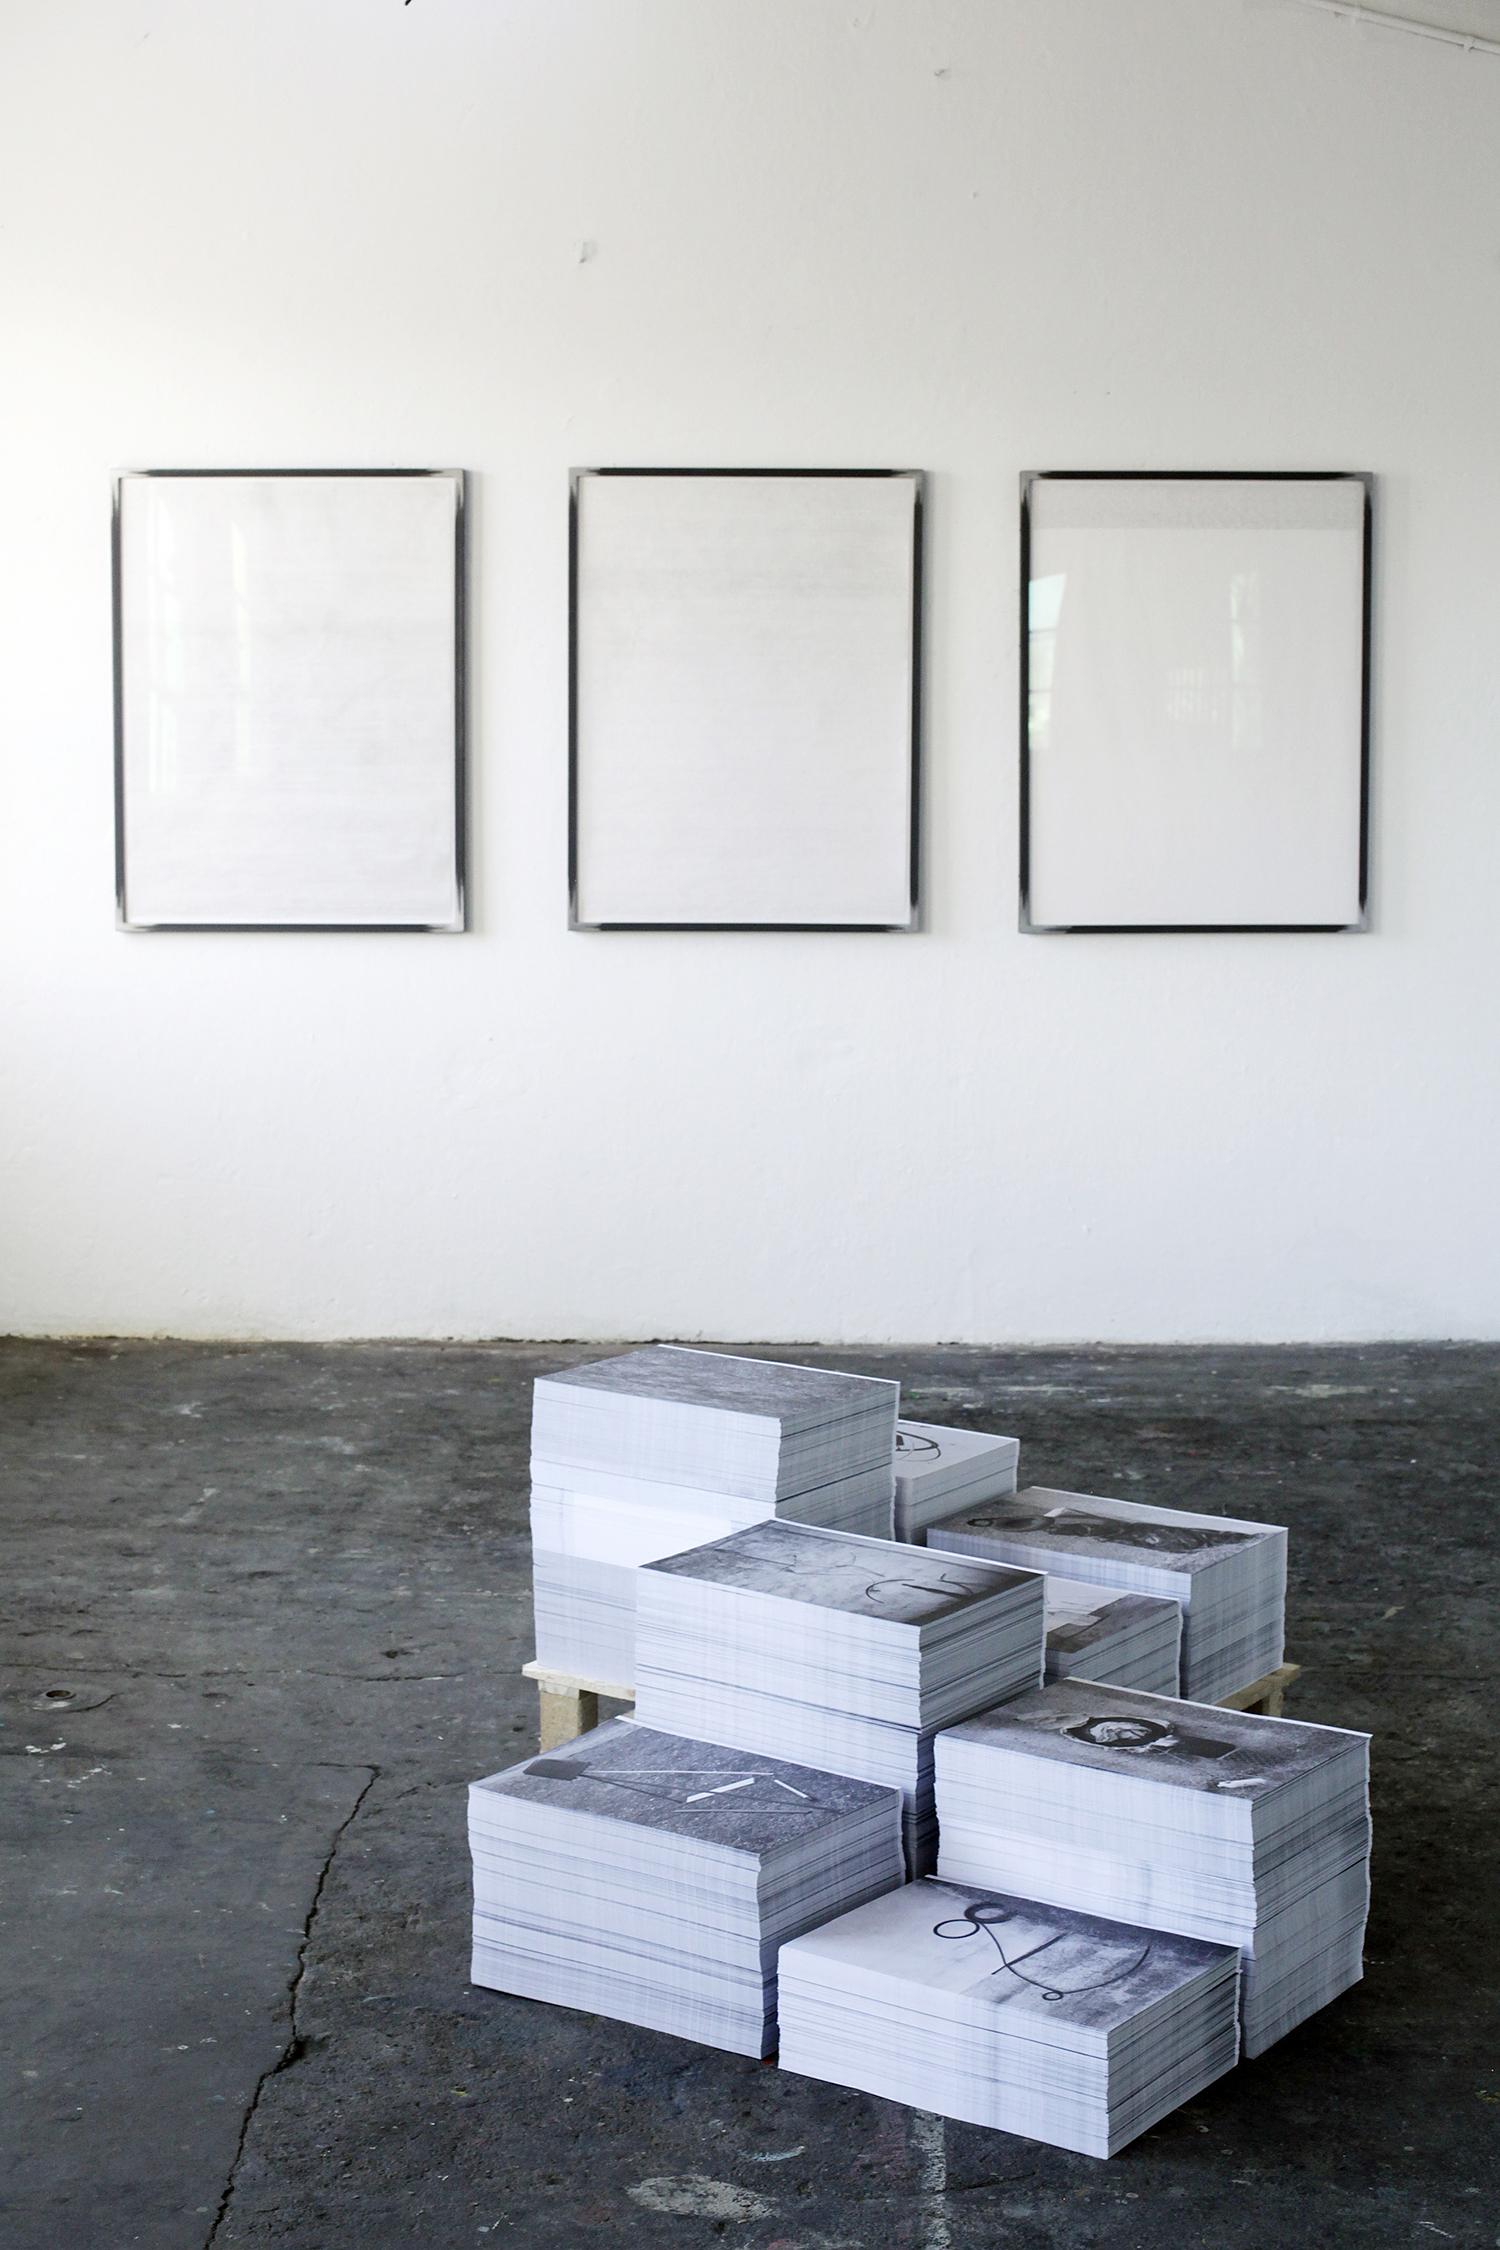 Work by Bärbel Praun.